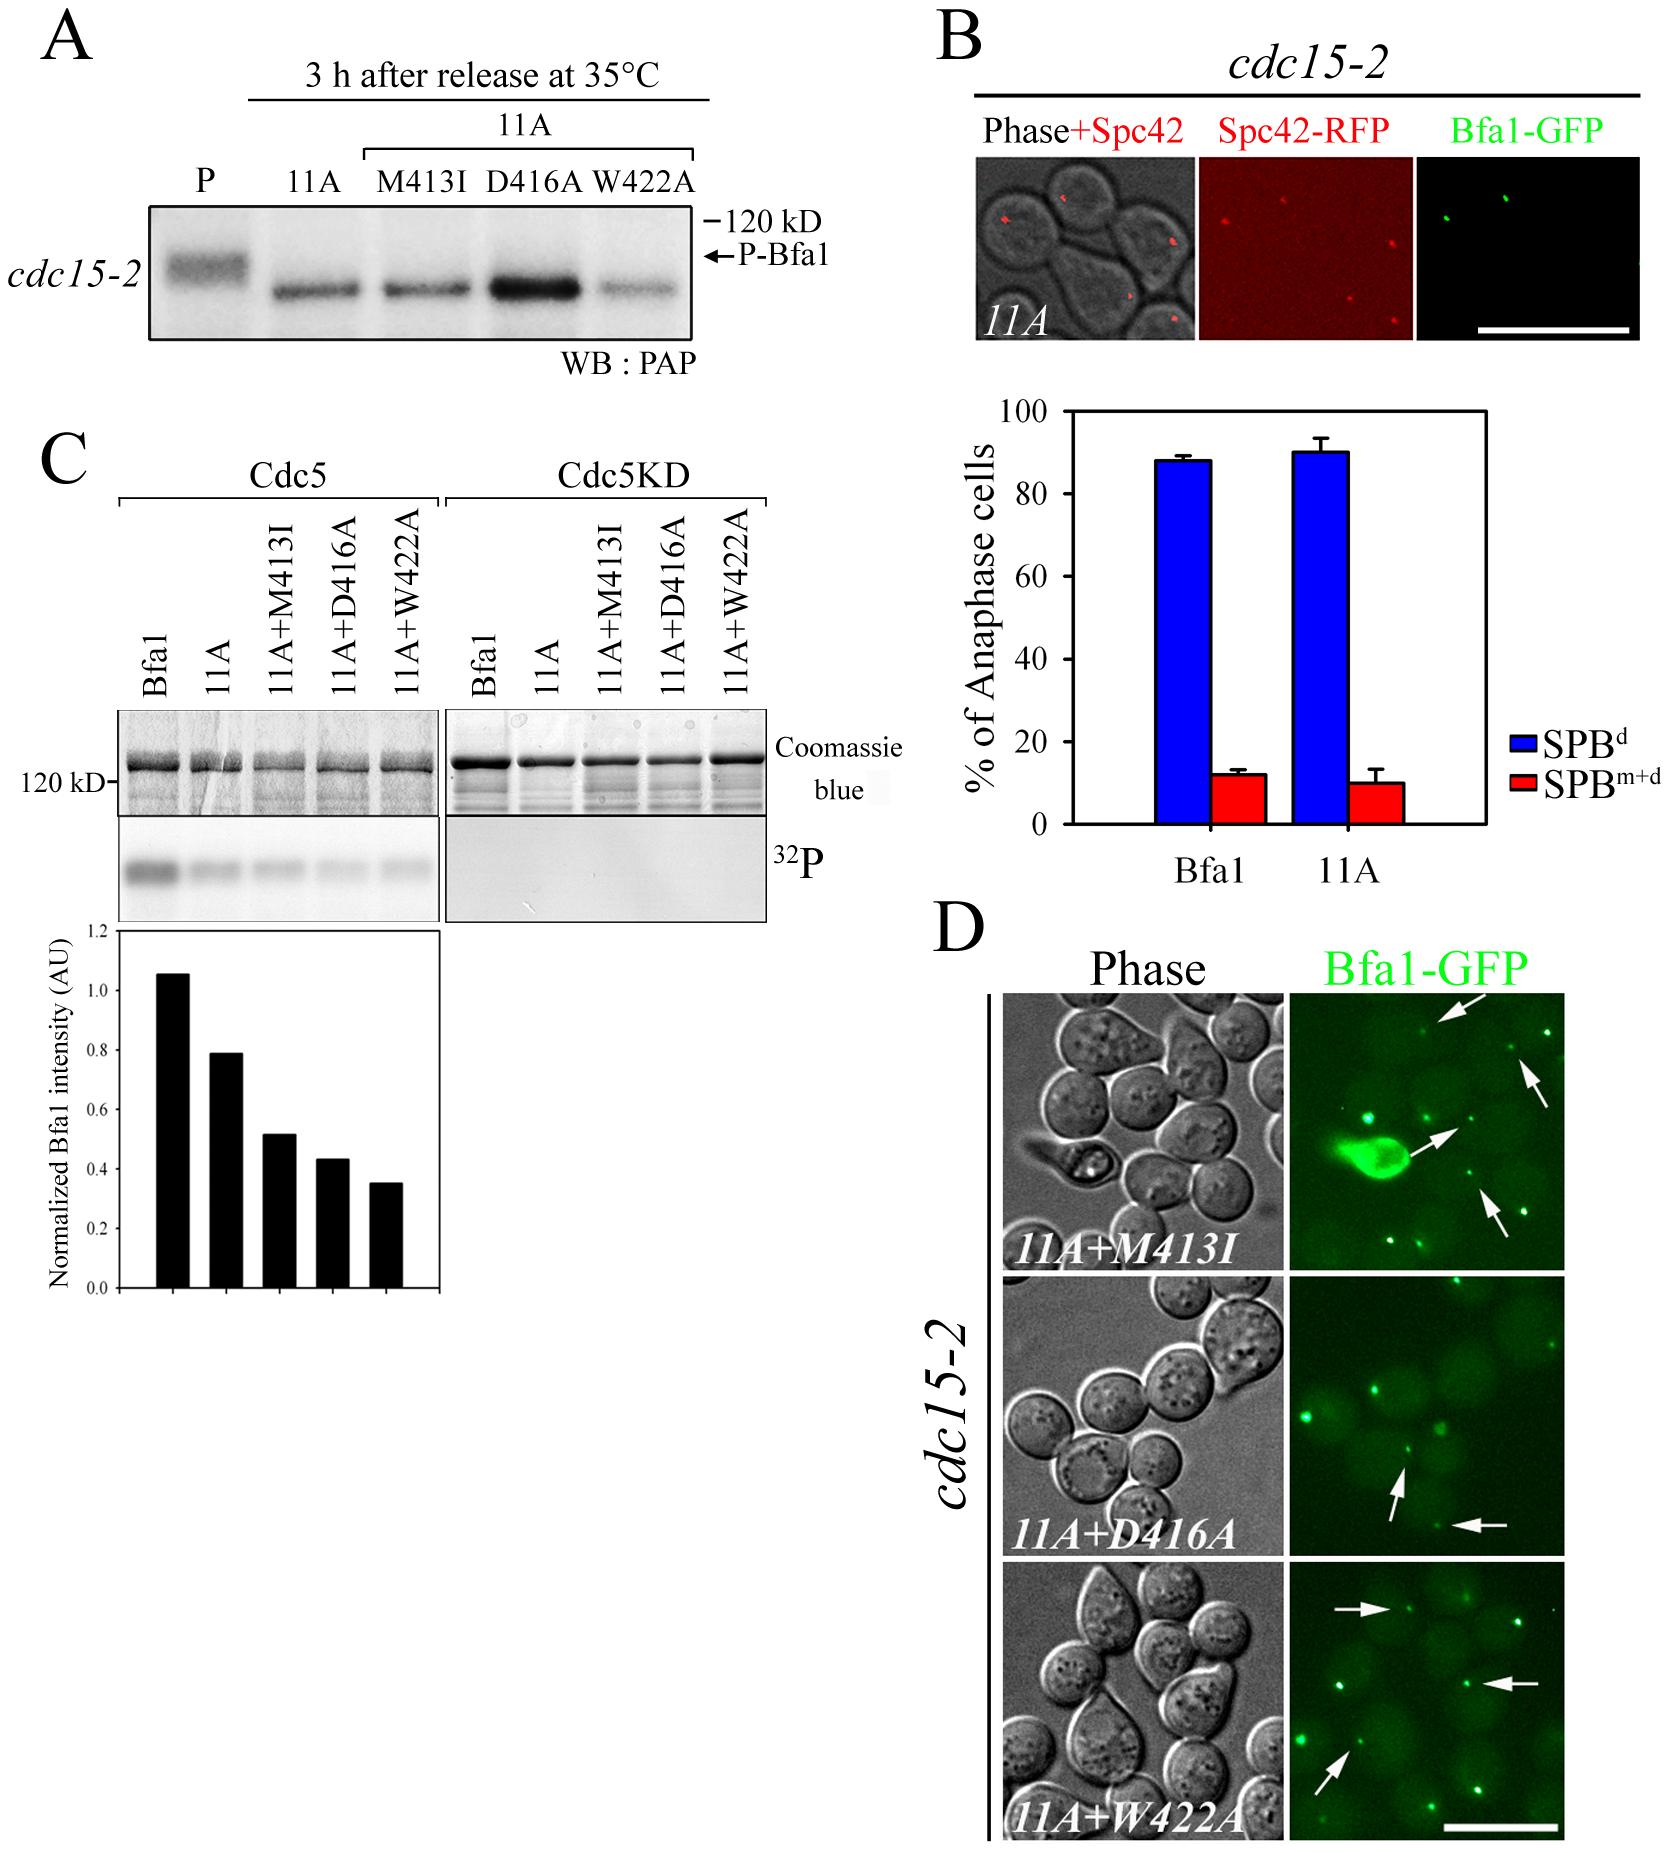 The localization and phosphorylation of Bfa1-11A, Bfa1<sup>M413I</sup>-11A, Bfa1<sup>D416A</sup>-11A, and Bfa1<sup>W422A</sup>-11A.